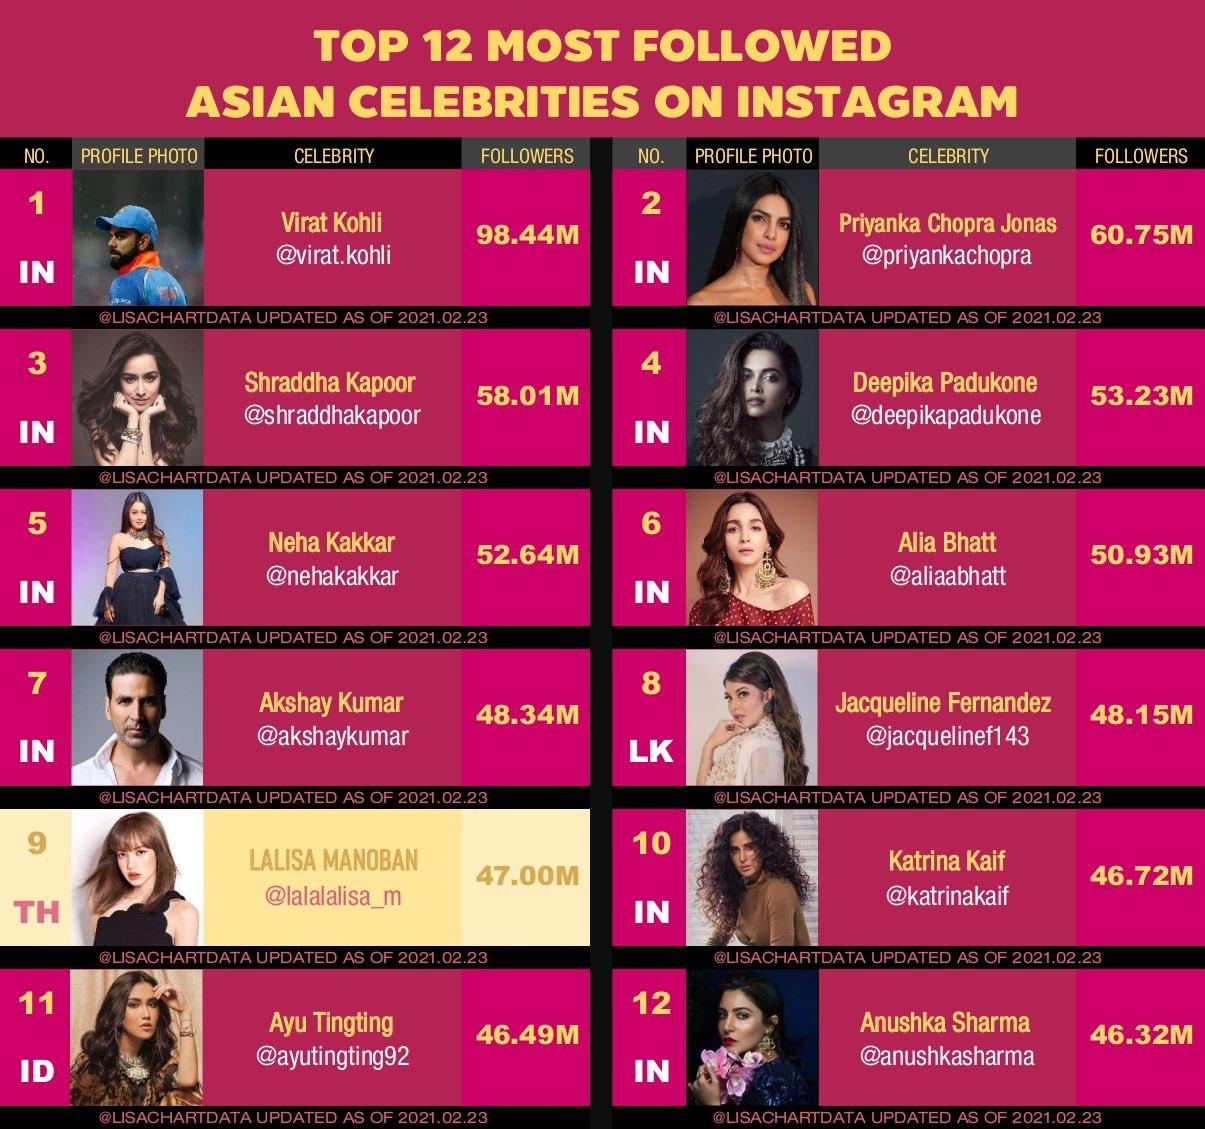 #LISA47MPARTY ภาพถ่าย,#LISA47MPARTY แนวโน้มของ Twitter - ทวีตด้านบน